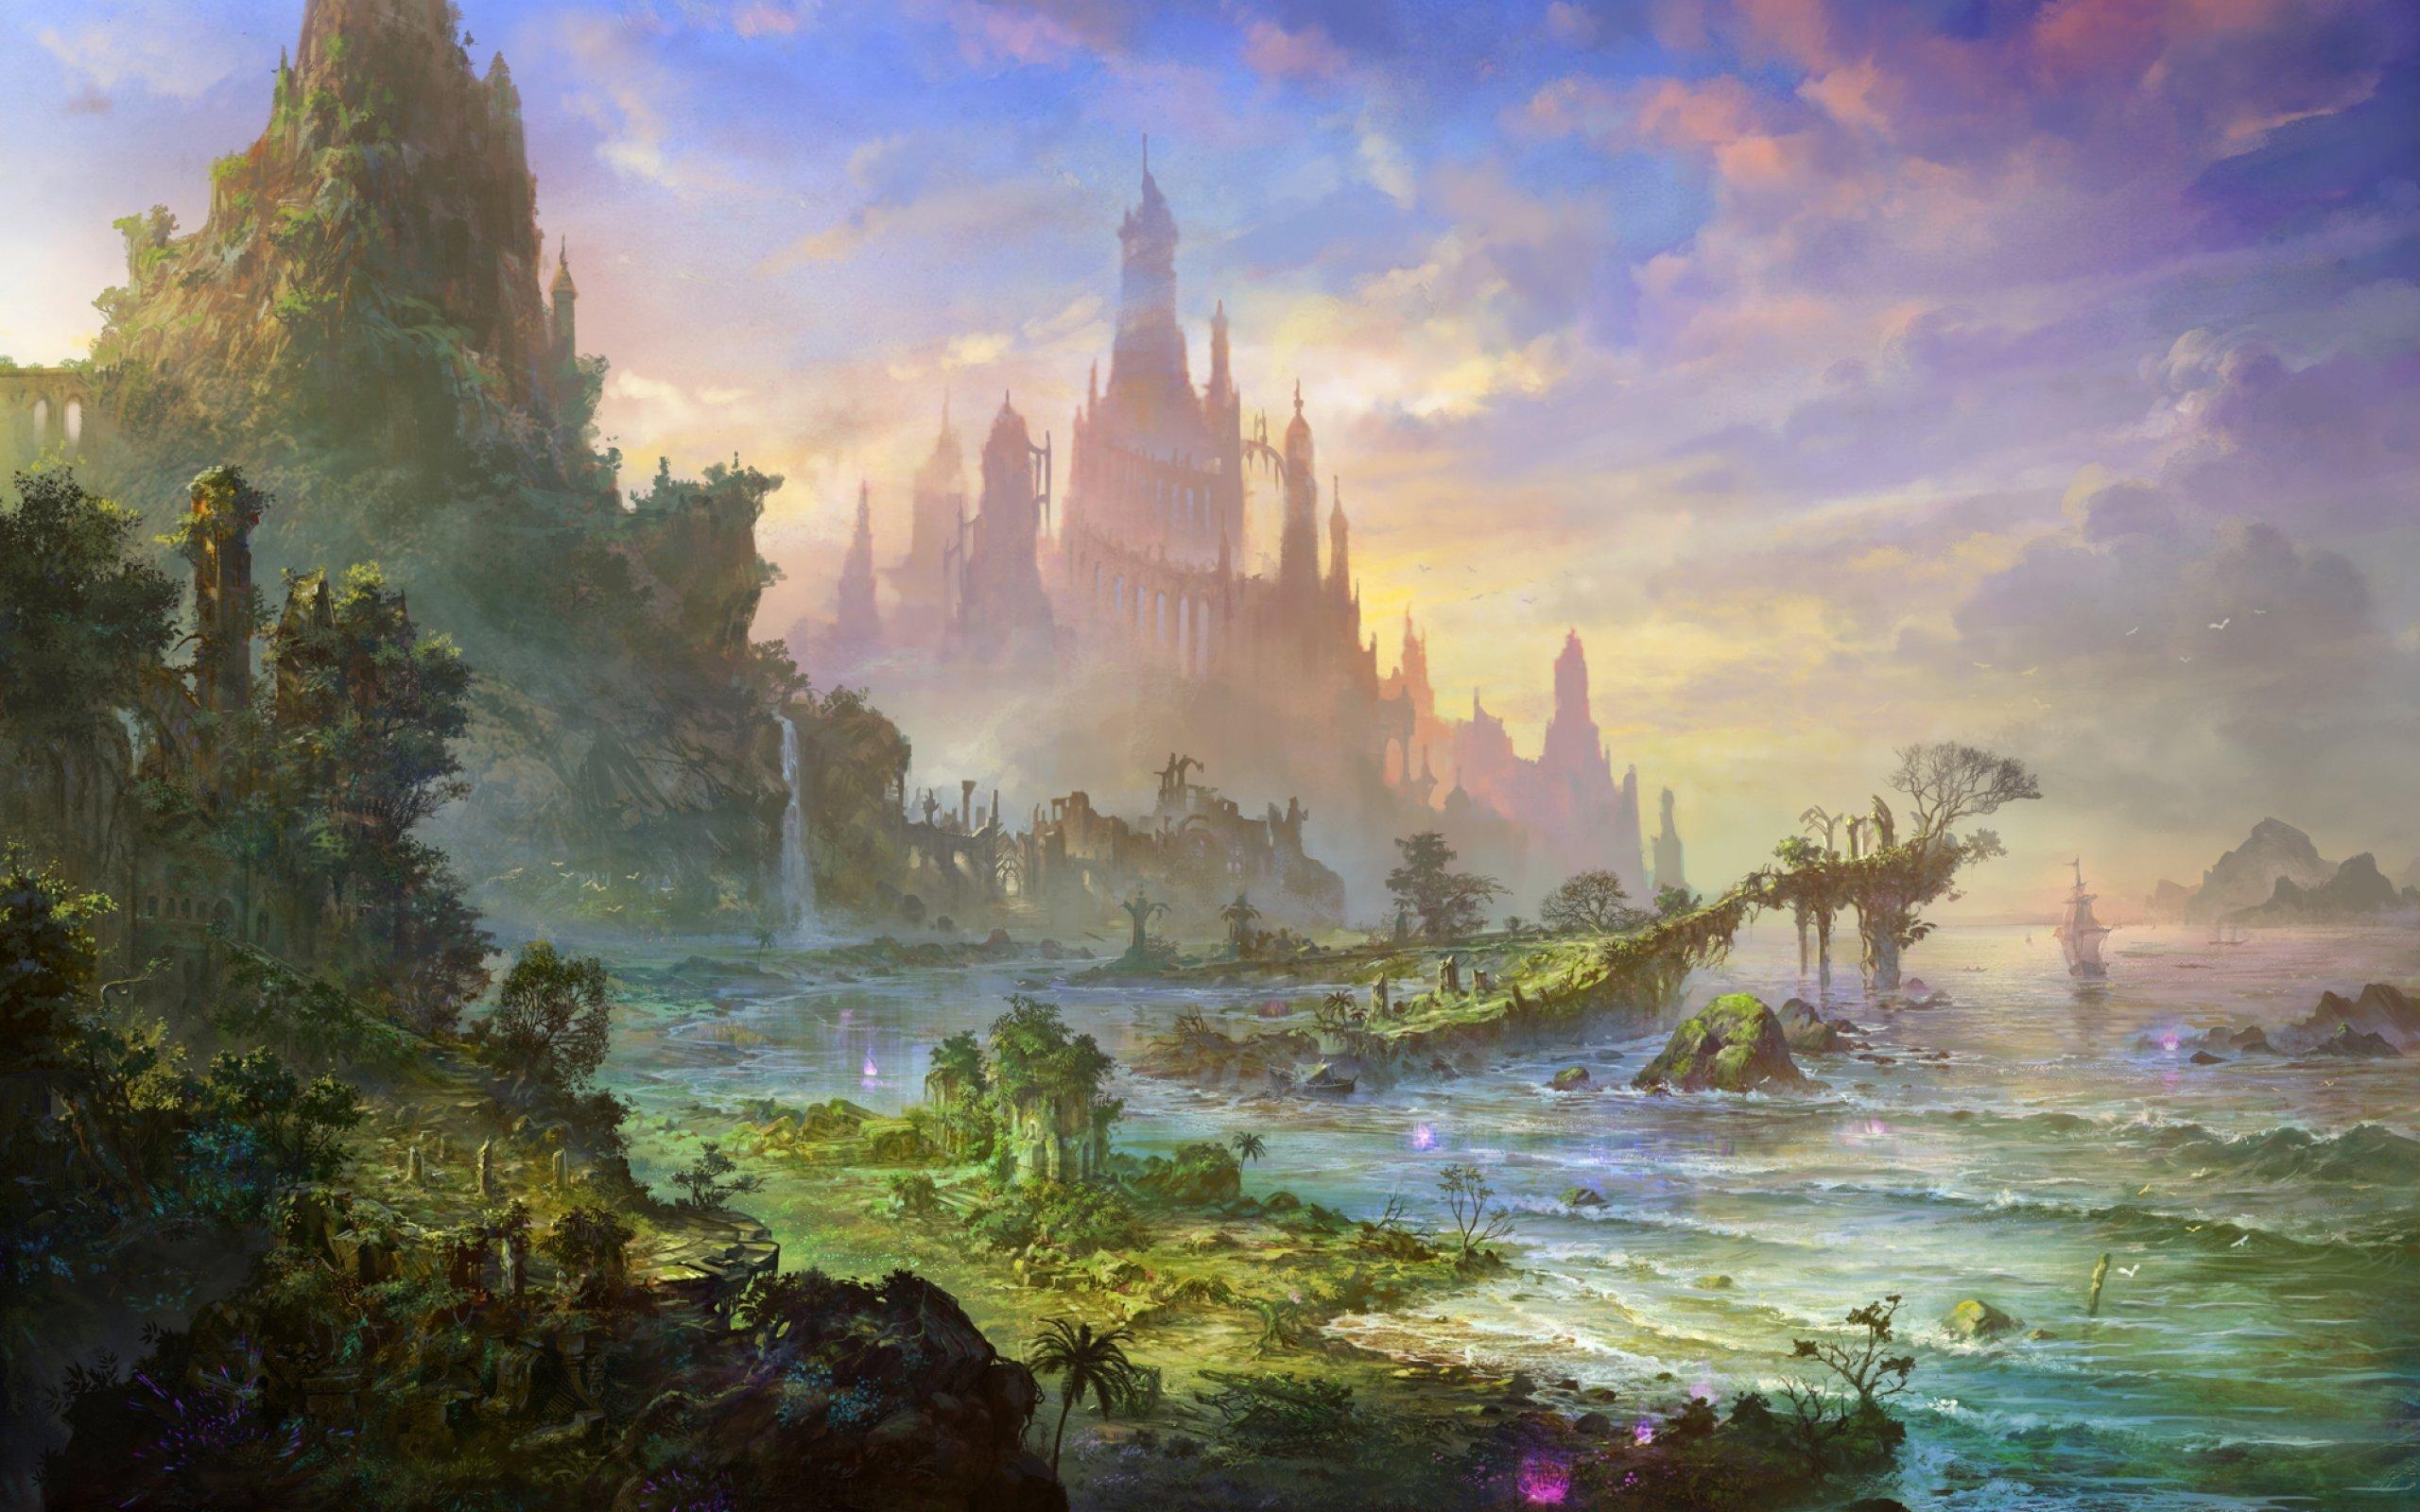 2560x1600 landscape drawing wallpaper - photo #27